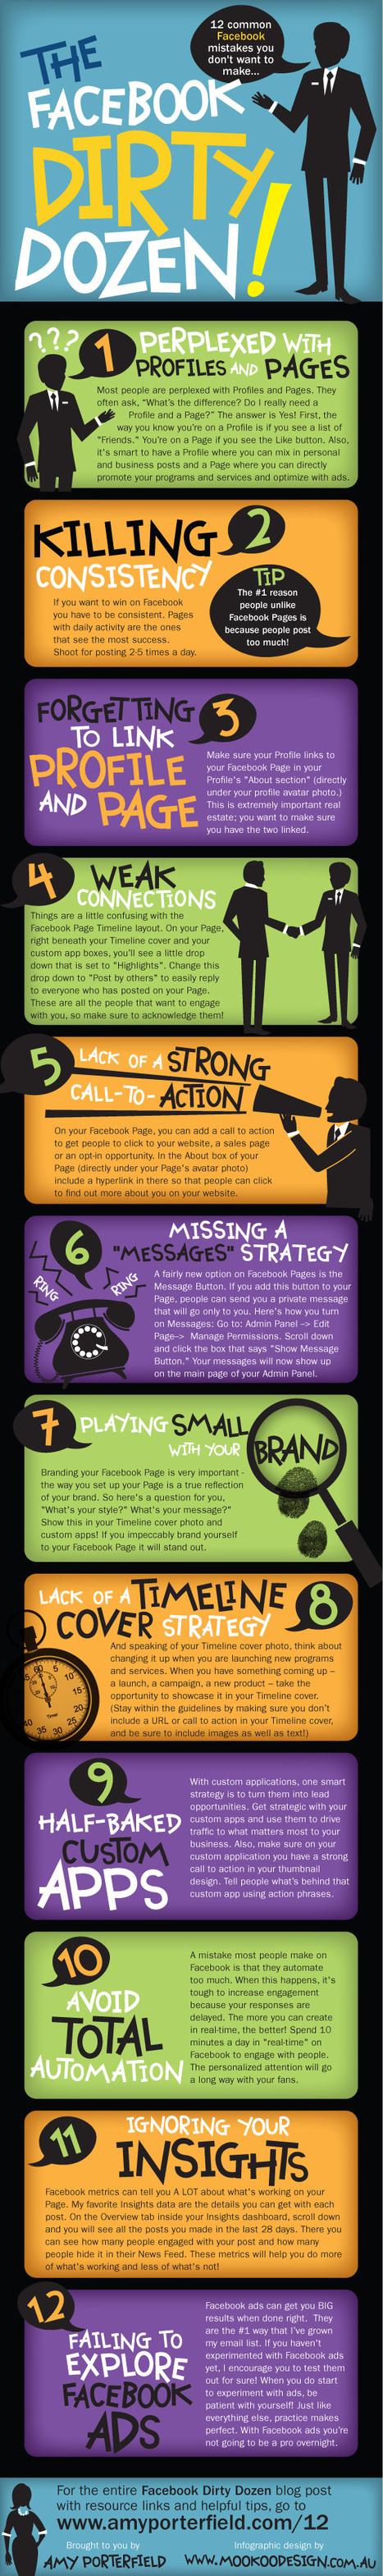 El Facebook Dirty Dozen [Infografía] - Amy Porterfield | infografias - infographics | Scoop.it